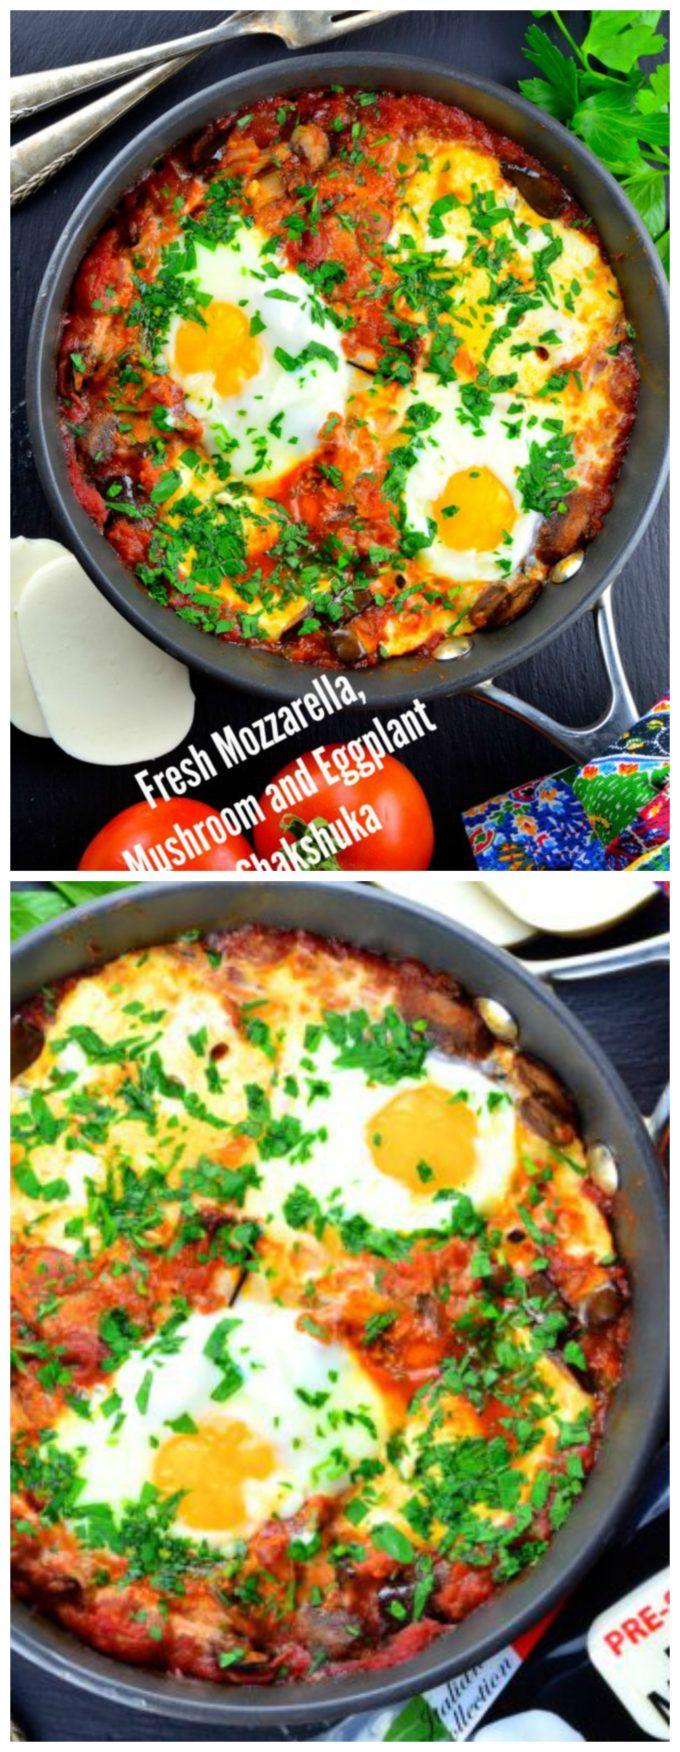 Fresh Mozzarella, Mushroom and Eggplant Shakshuka . Great vegetarian breakfast recipe for Passover and all year long. I eat it for dinner too!